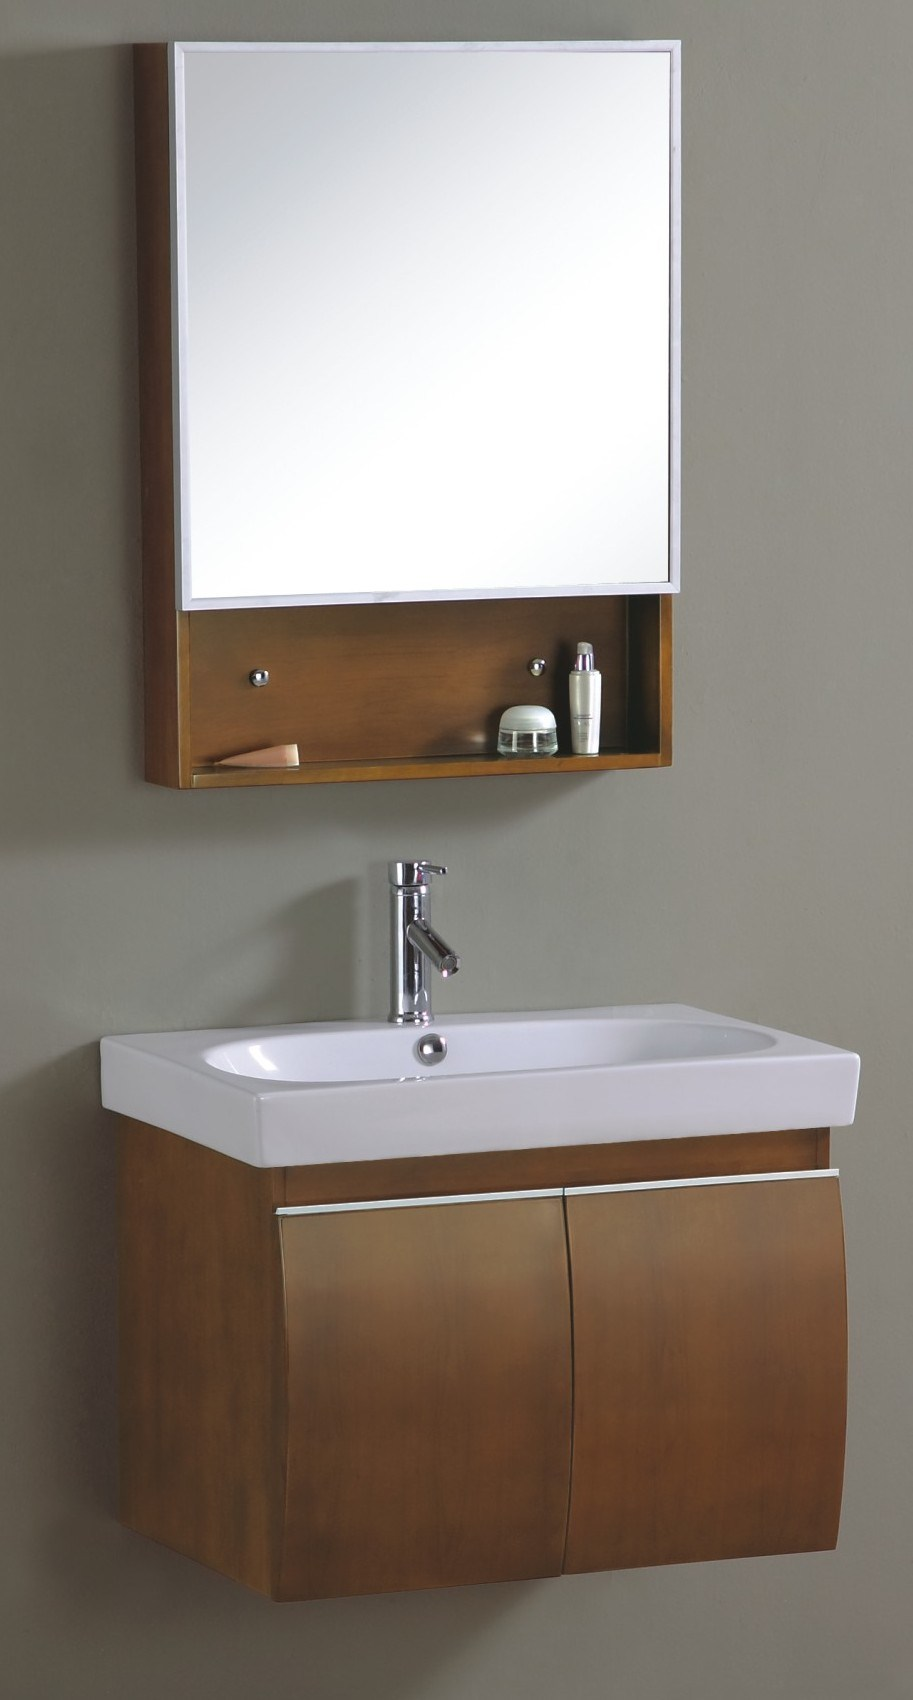 China Wall Mounted Fashion Wooden Bathroom Vanity Cabinet ...